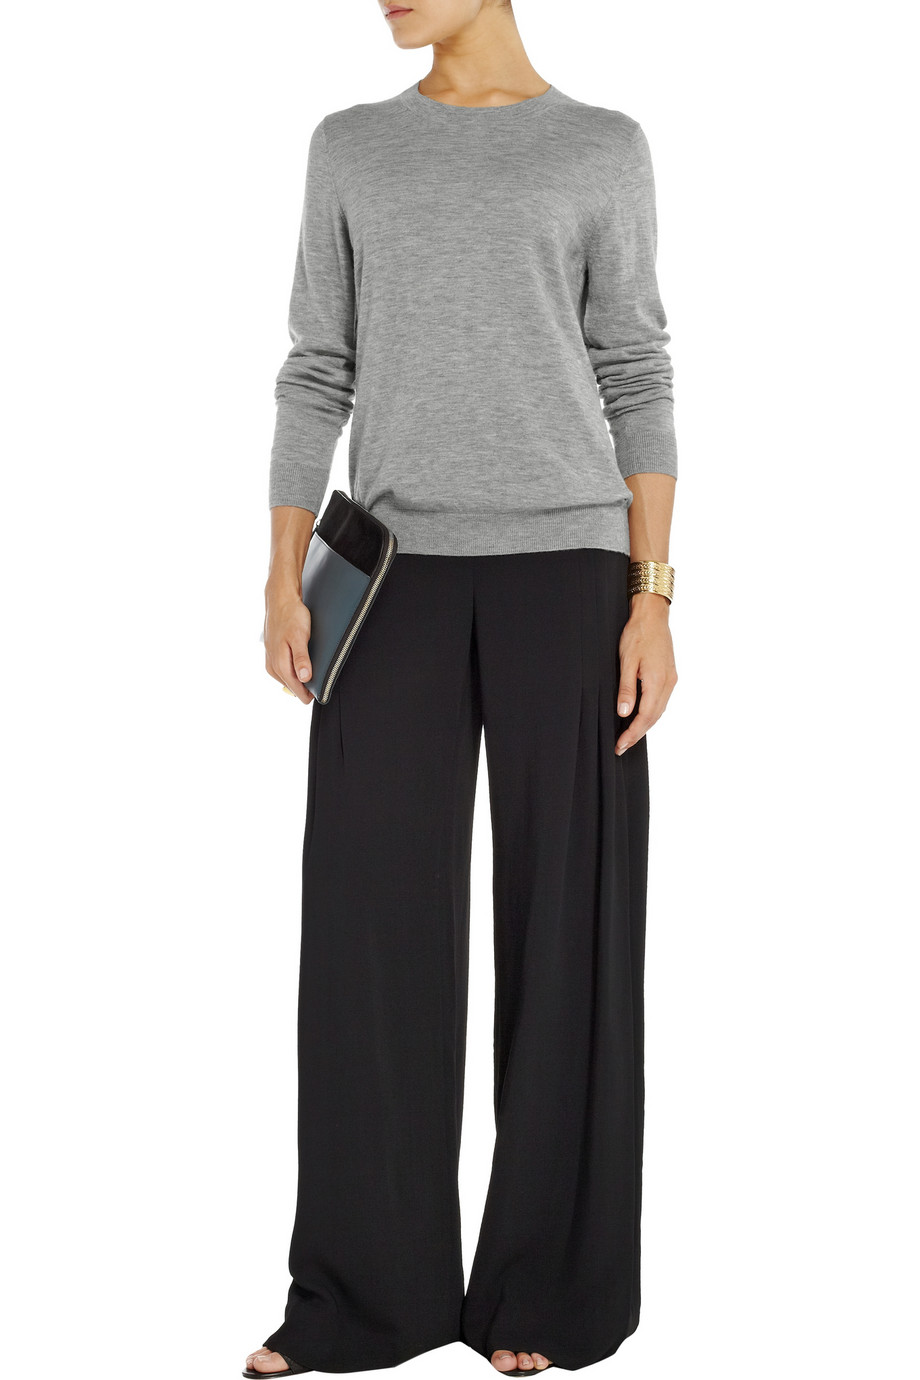 a2494dd629807 Work Outfit Ideas